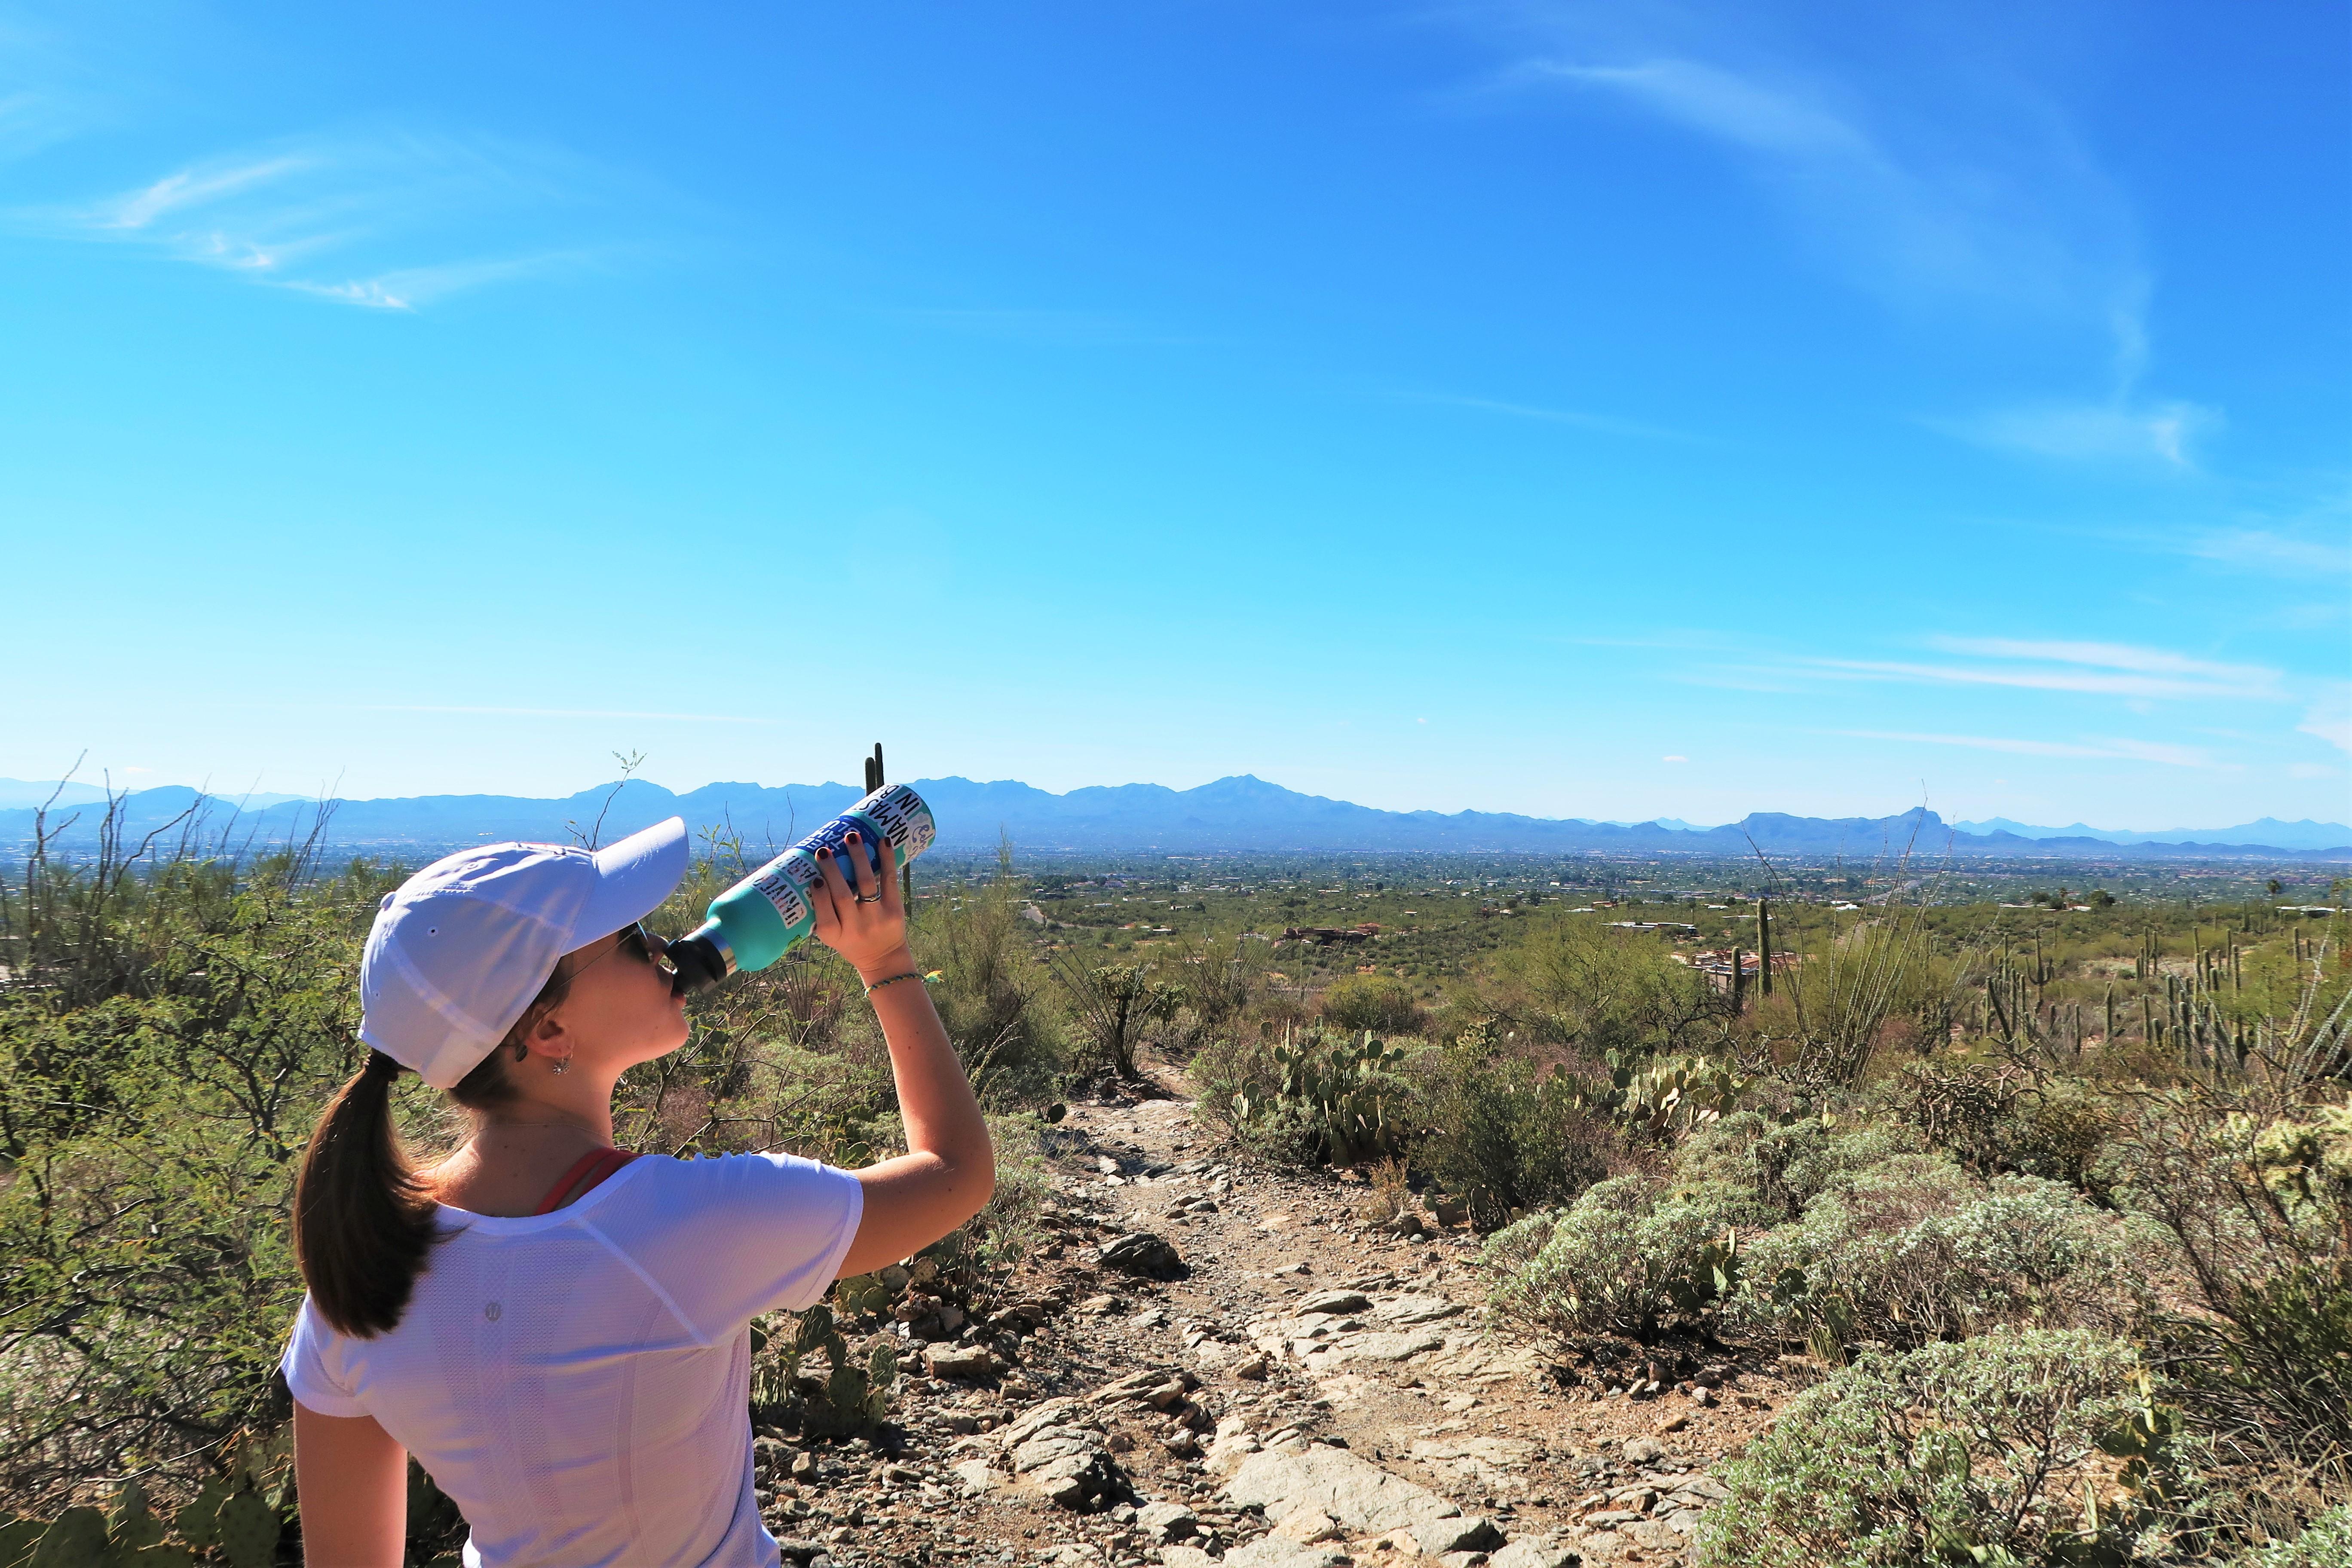 Pima canyon trail views over Tucson